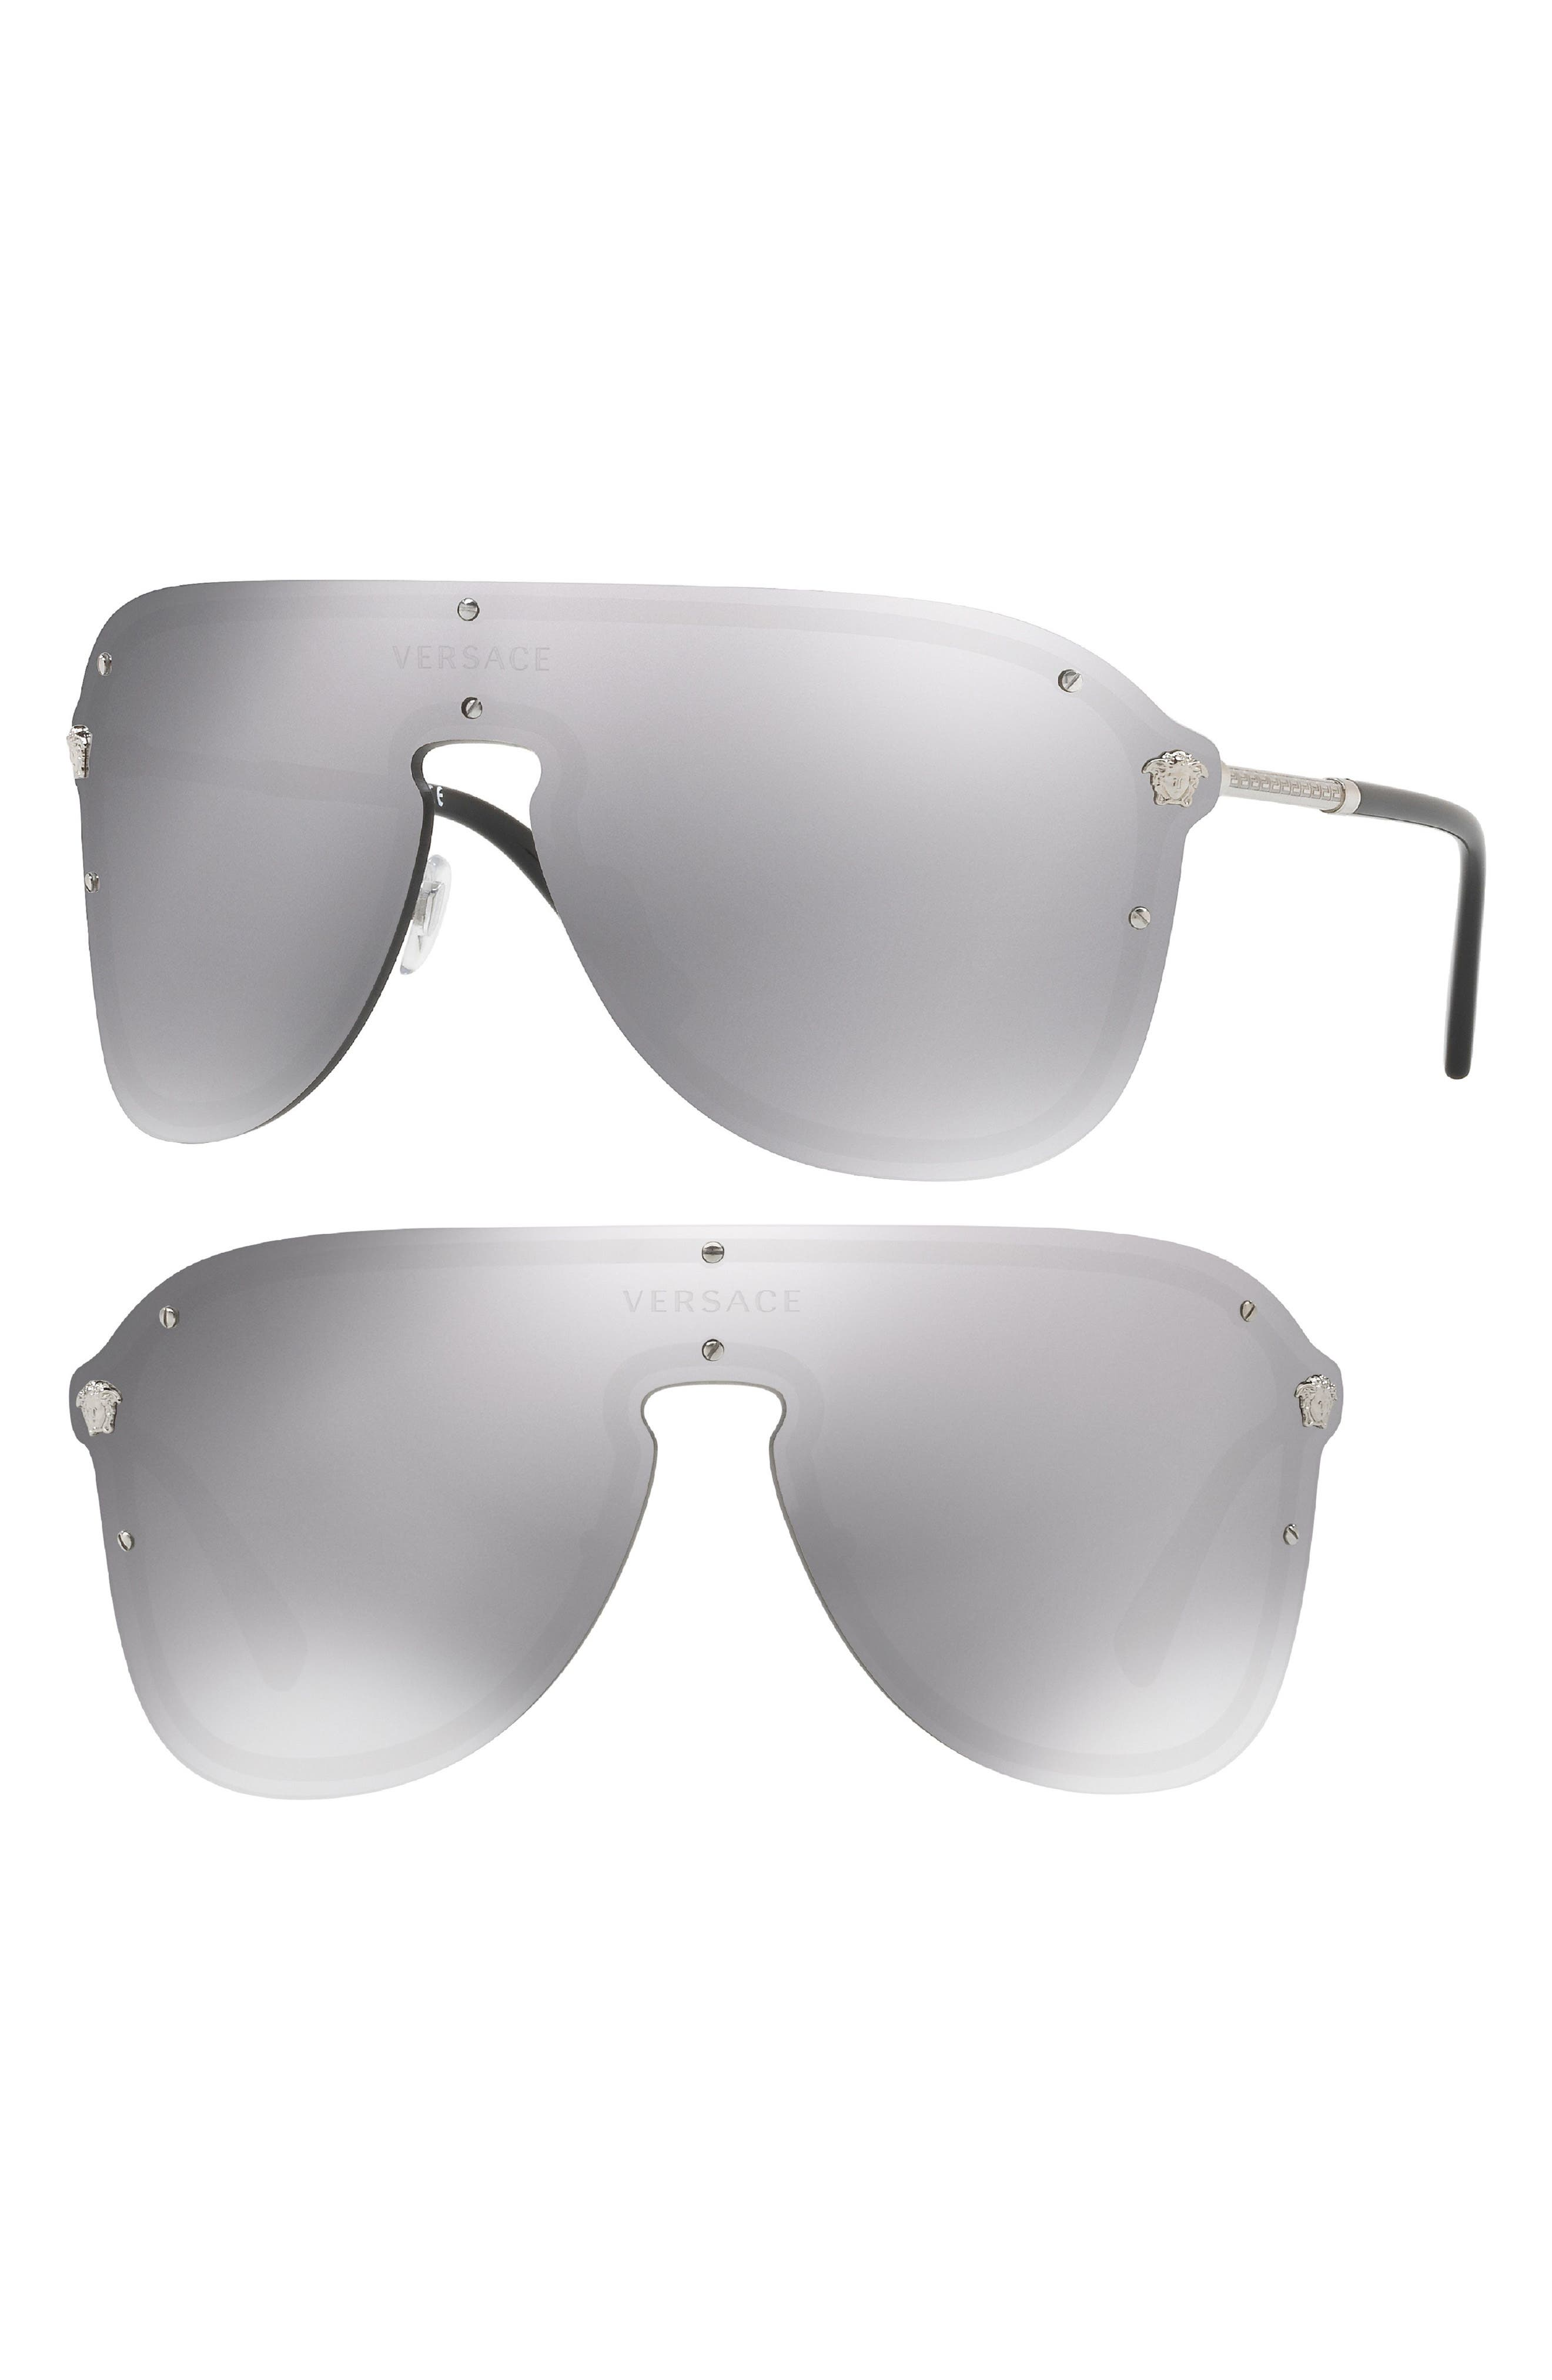 Versace 150mm Shield Sunglasses